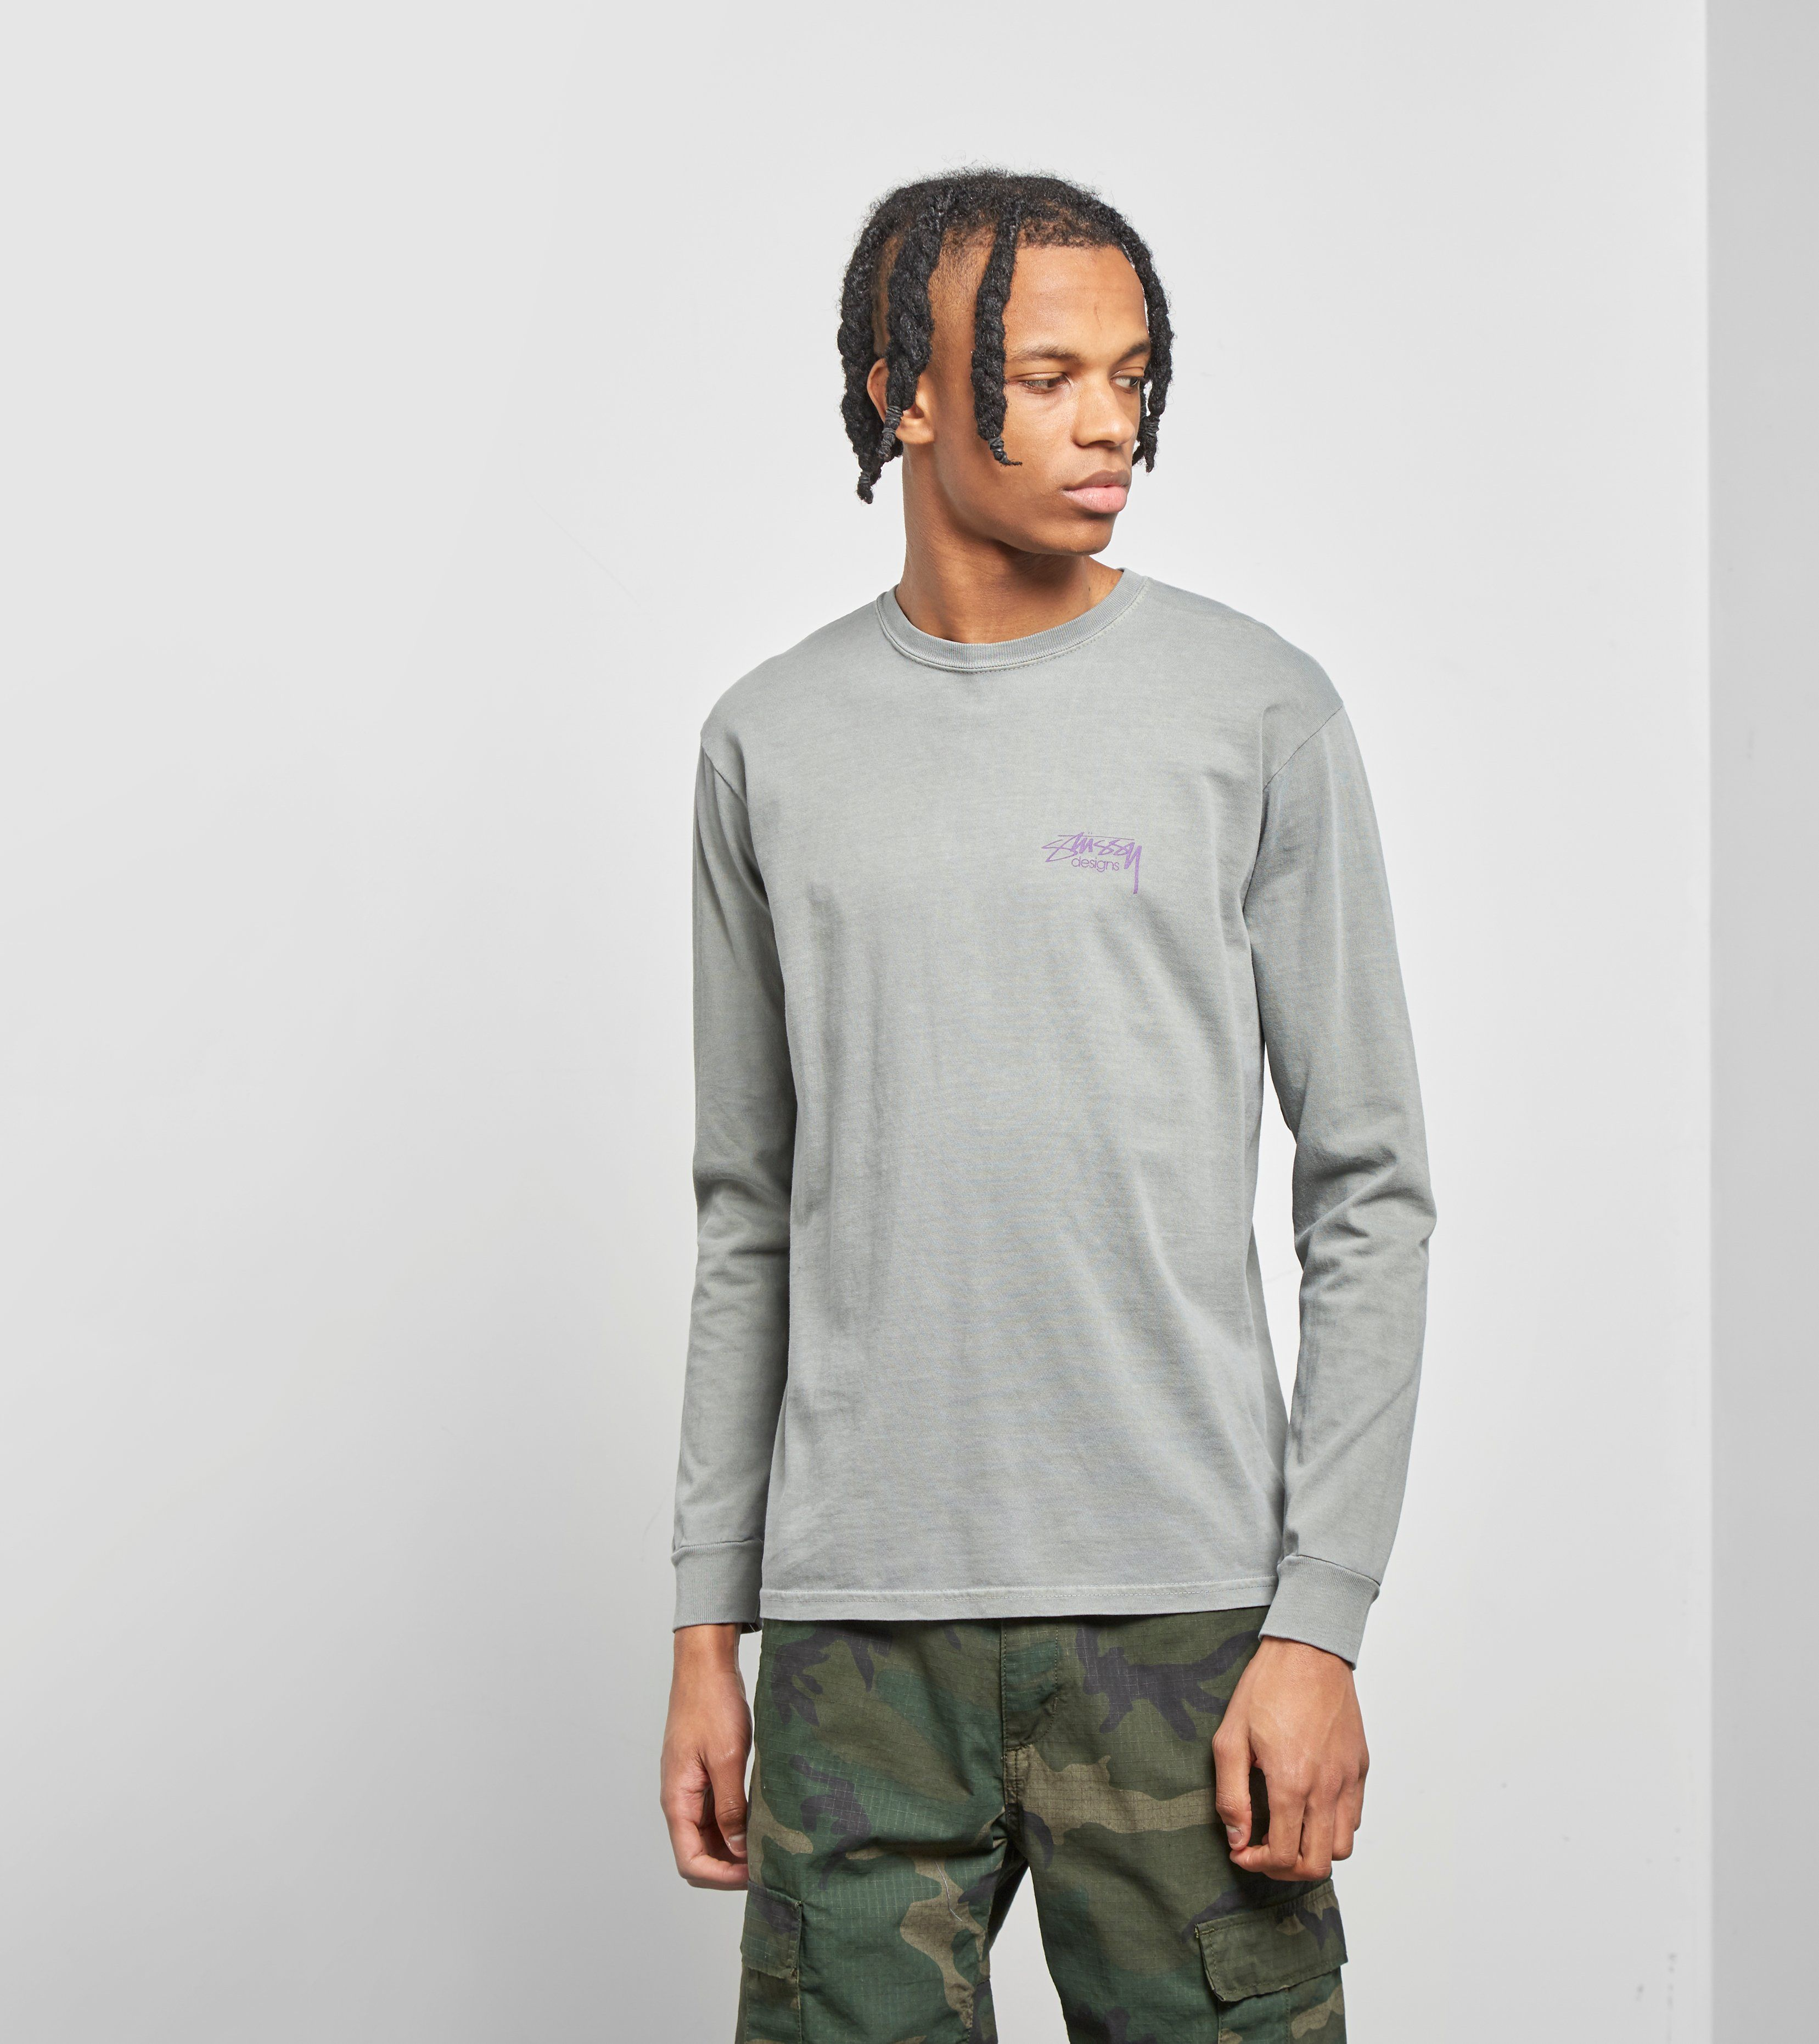 Stussy Long Sleeved Designs T-Shirt